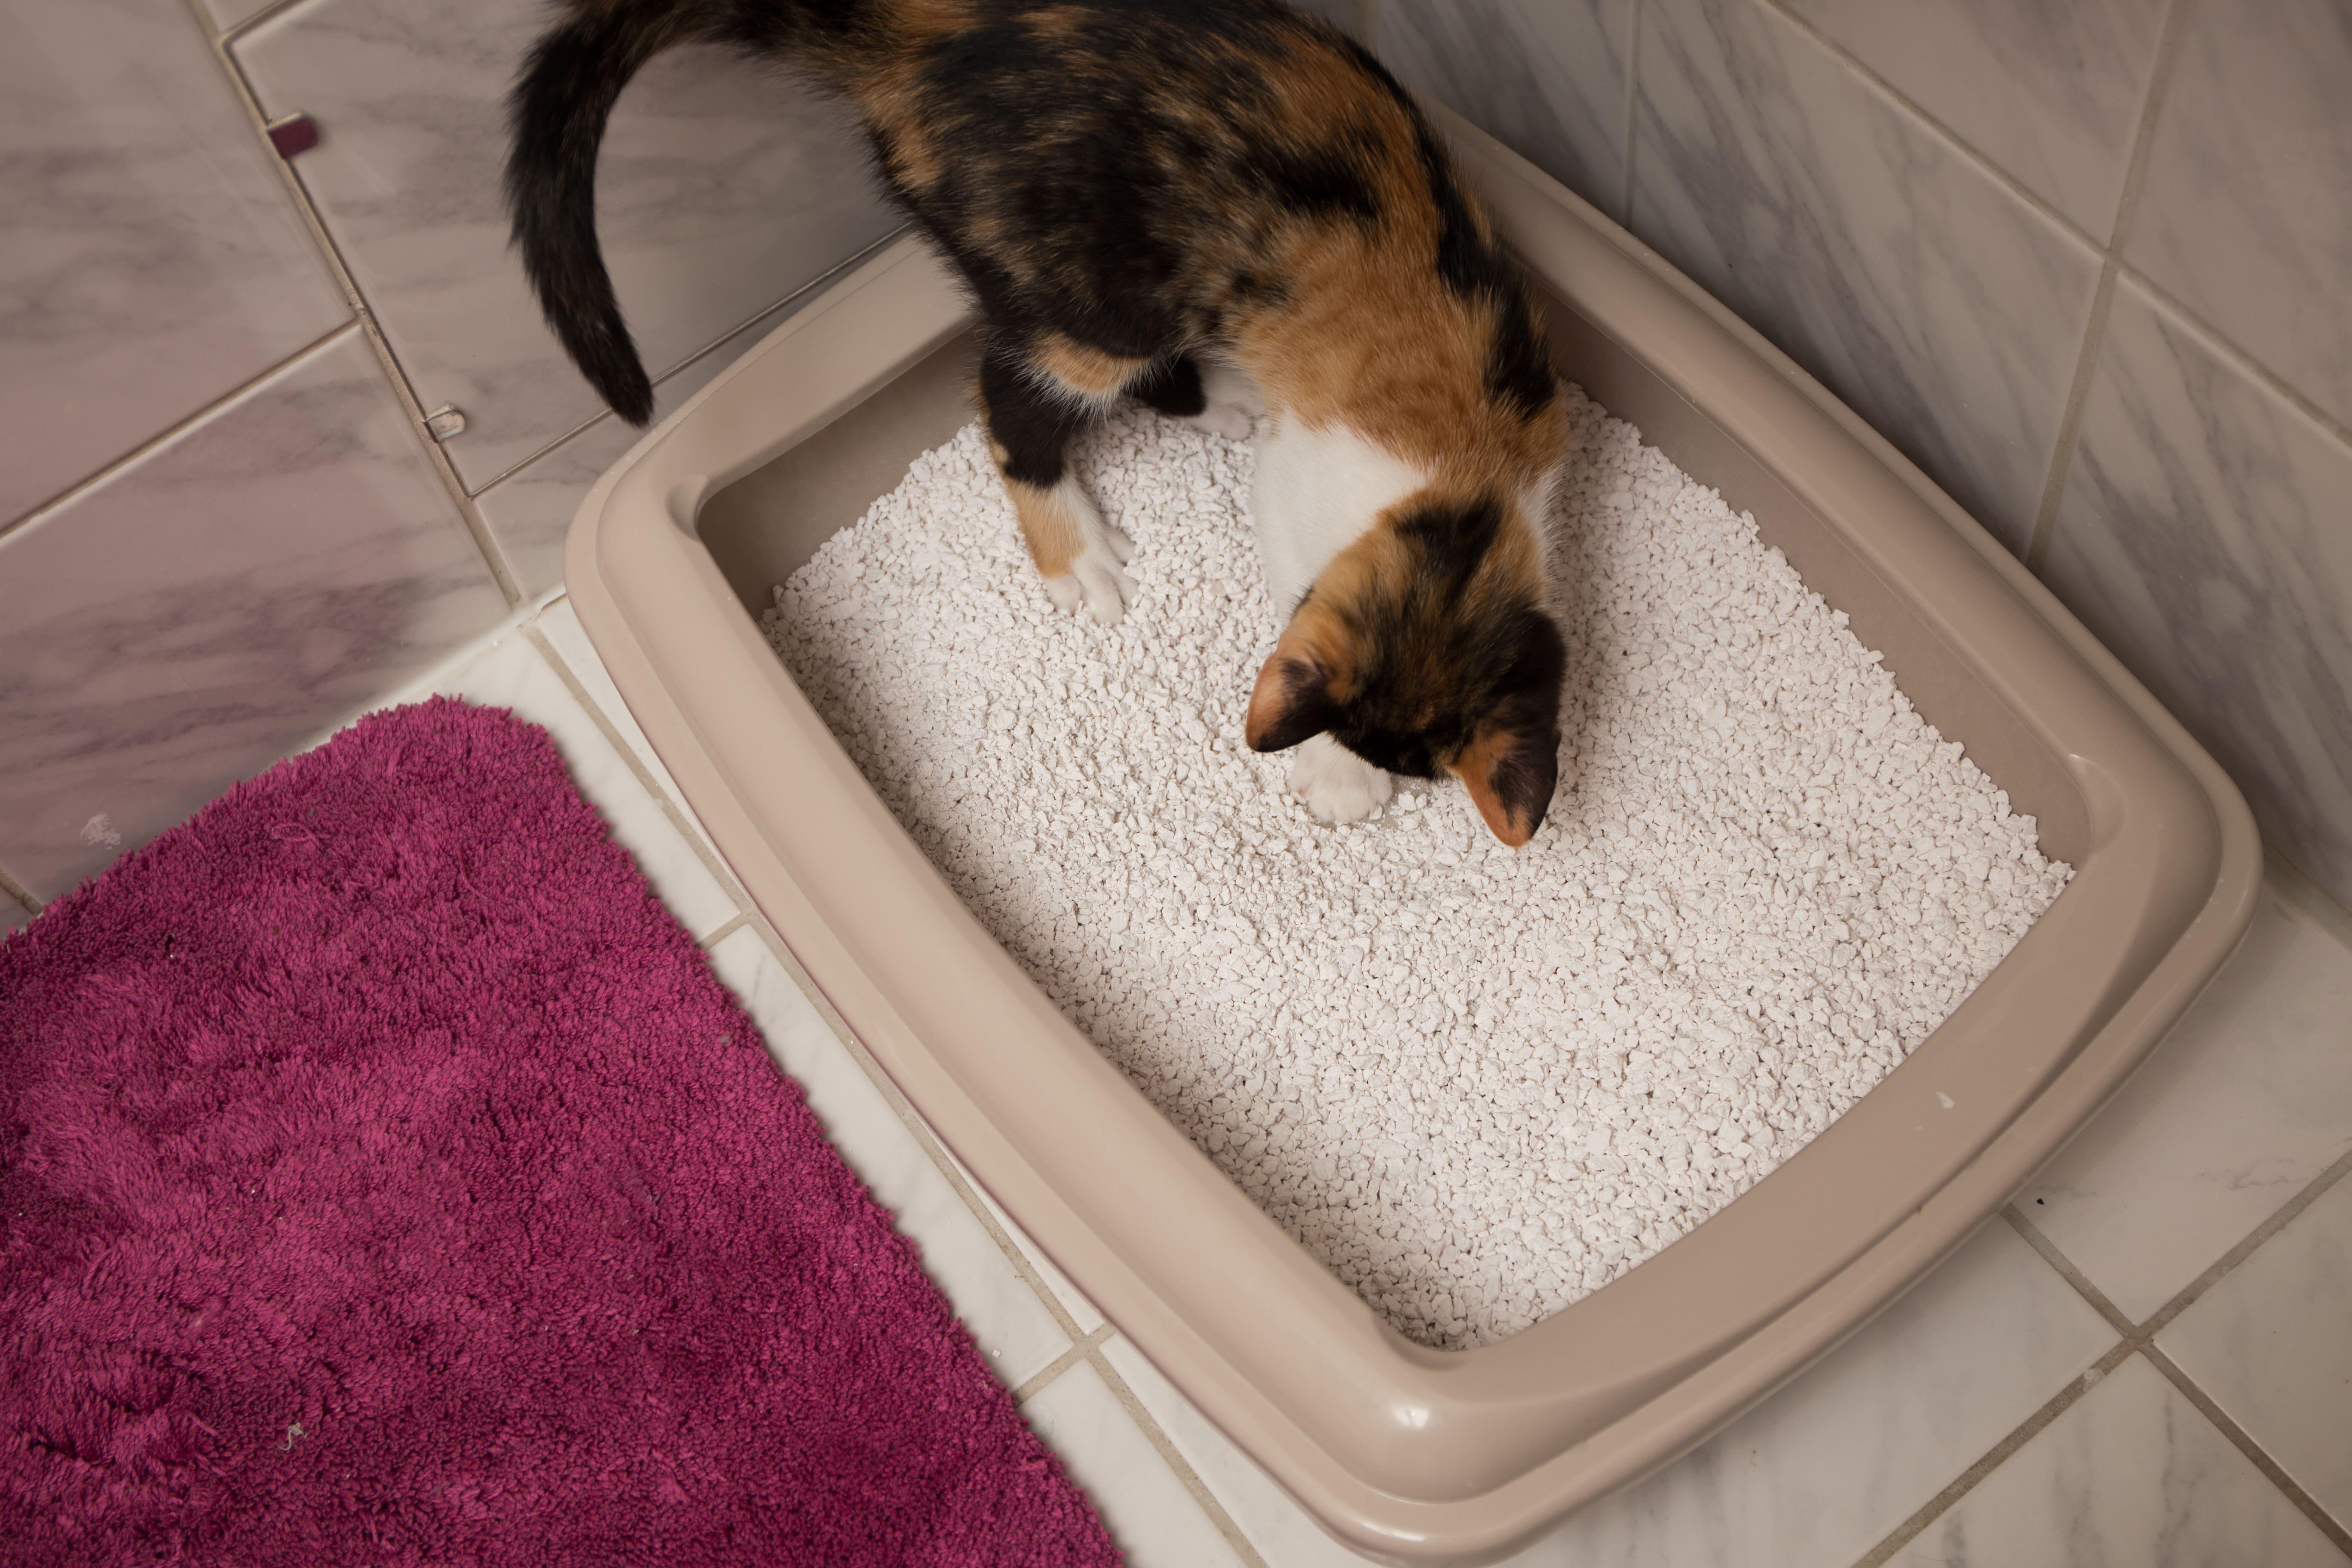 Katze testet auf Katentoilette Streu